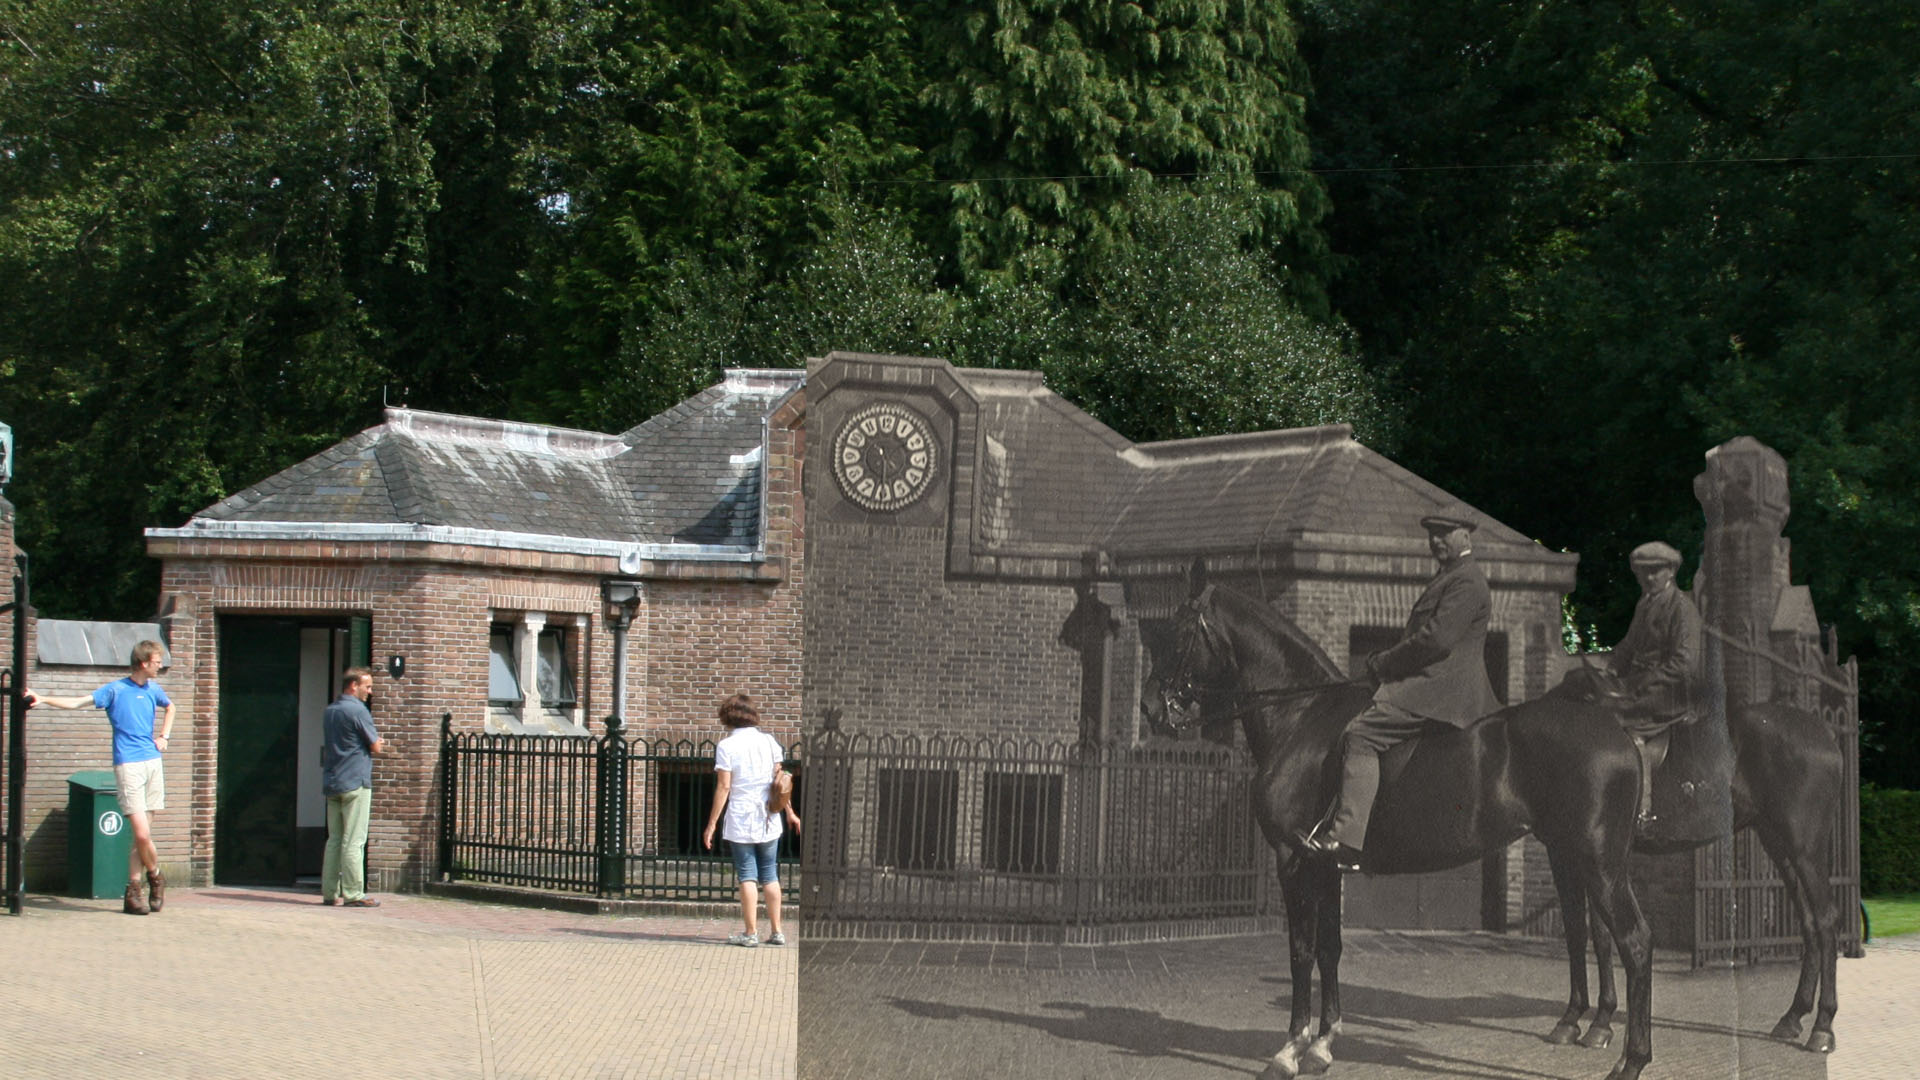 Studio Kort - Hoge Veluwe Augmented Reality